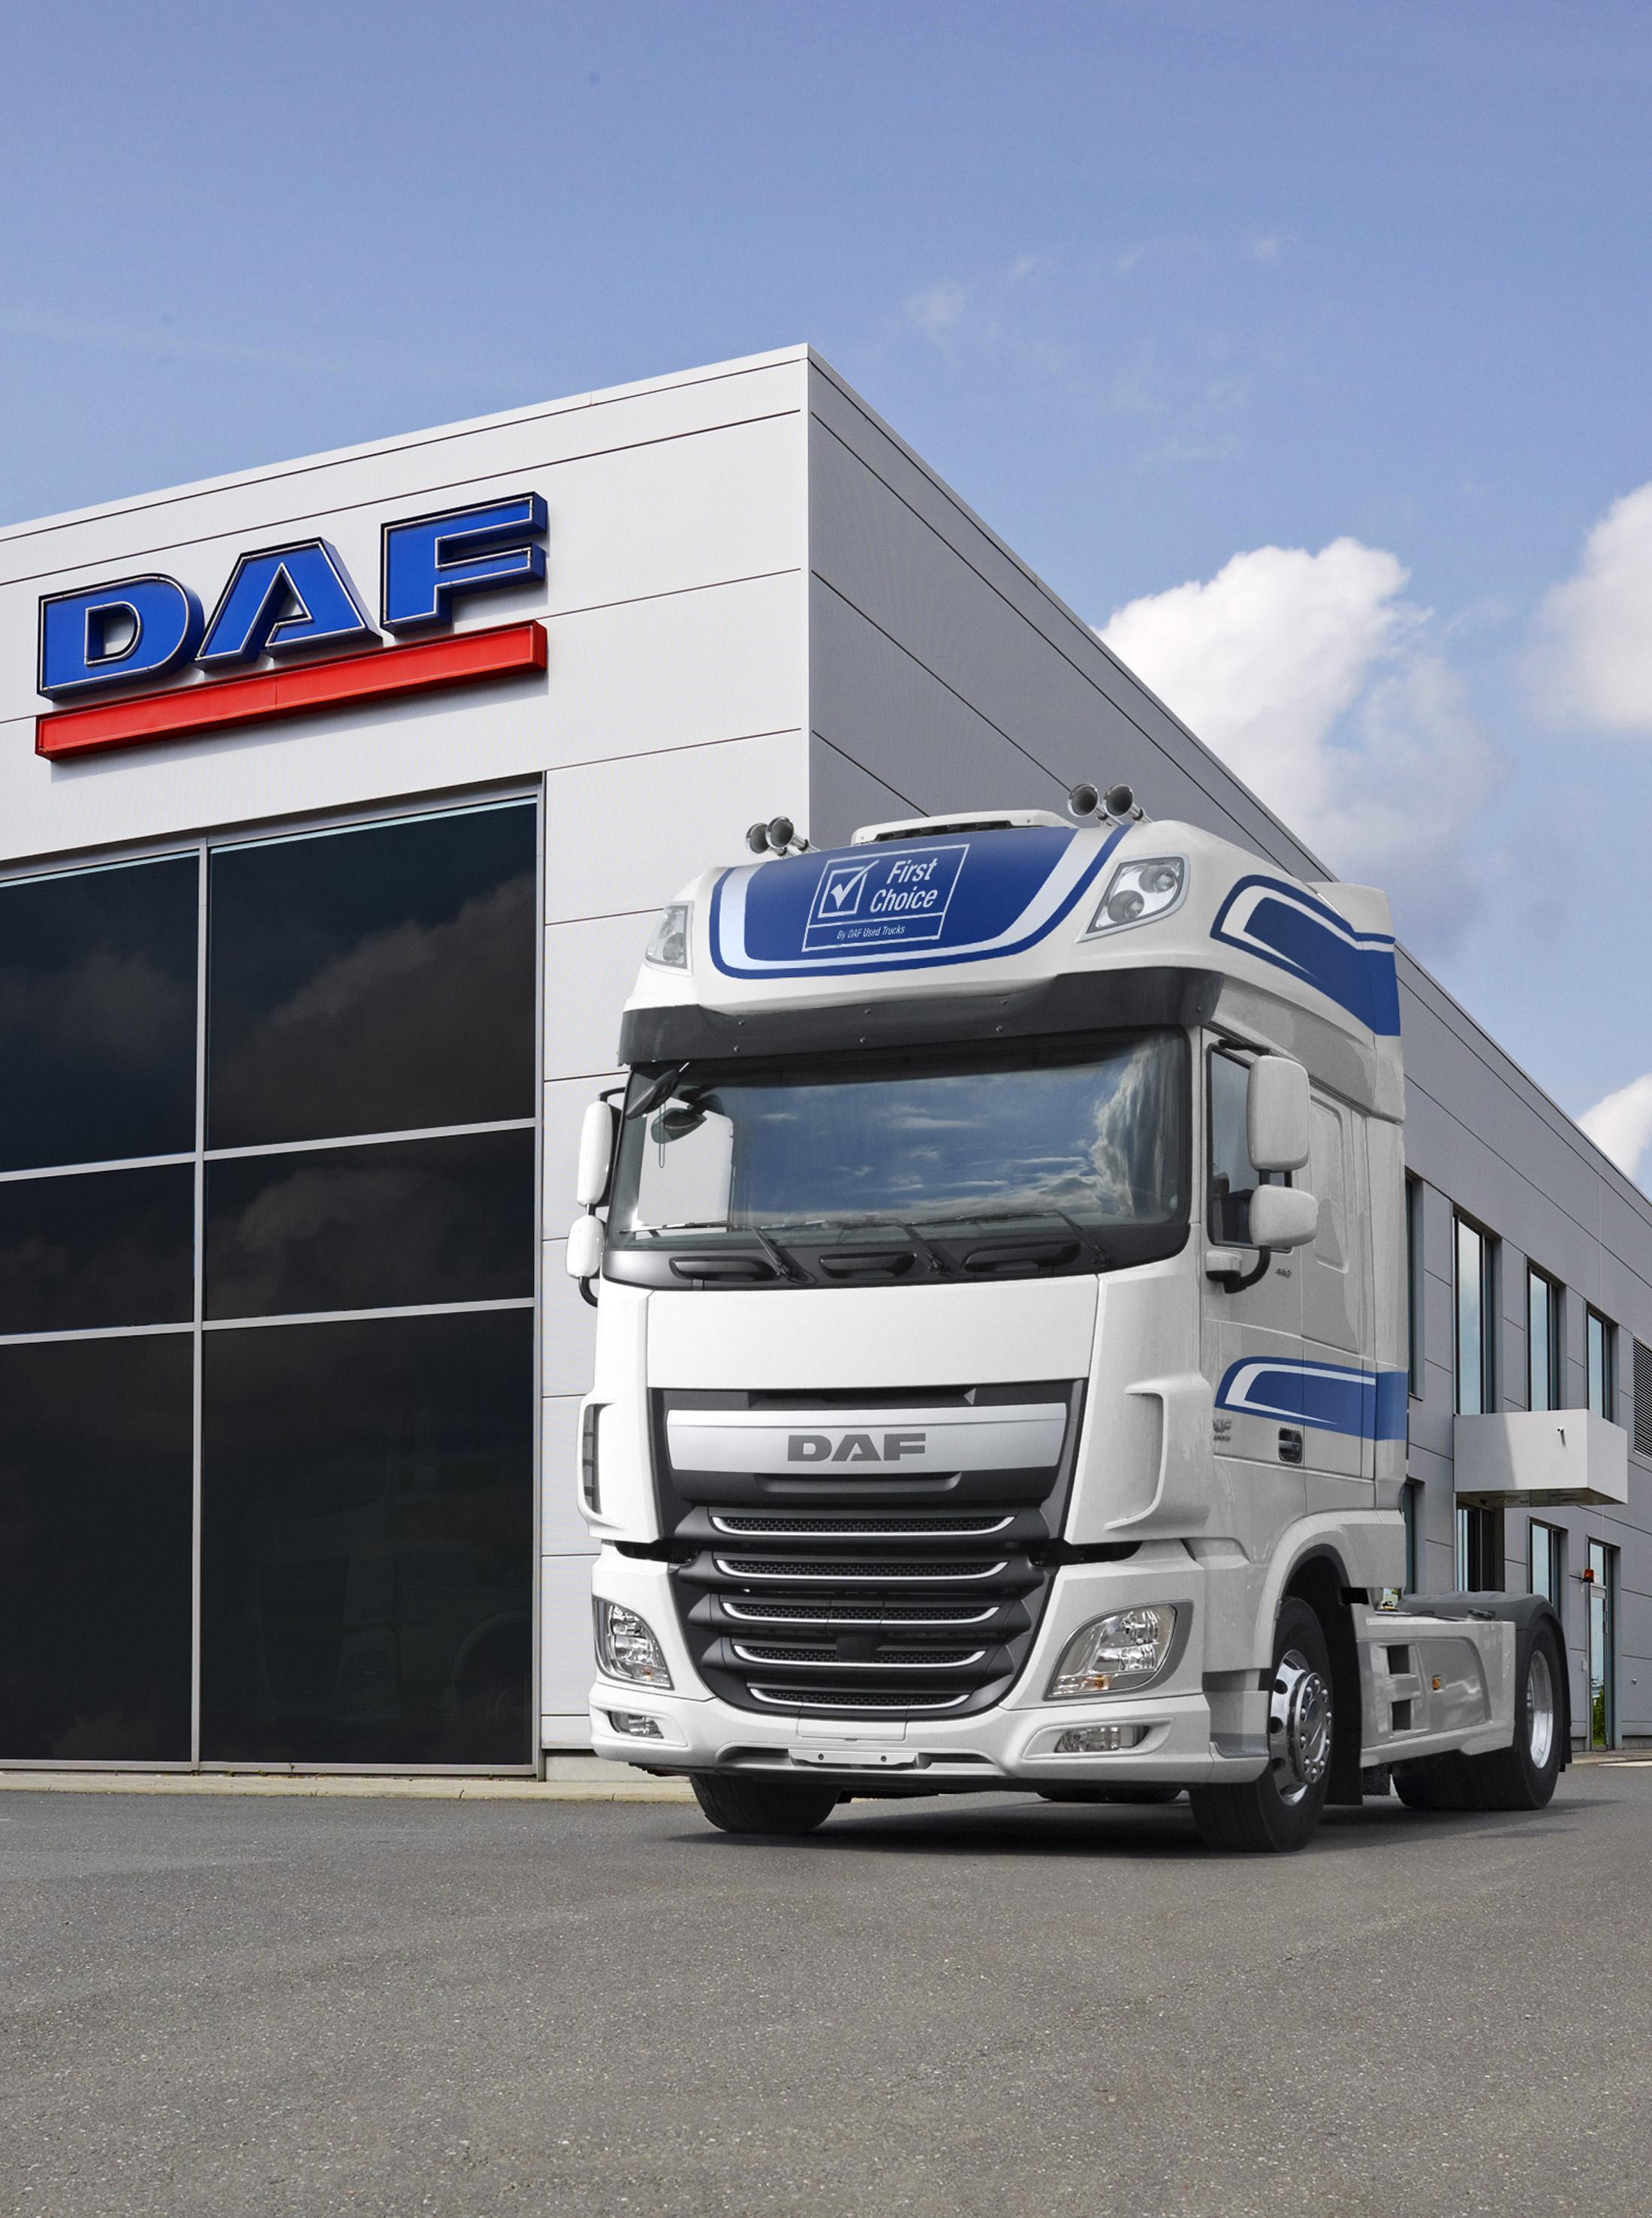 d2399cd167 Buying a used truck- DAF Trucks Ltd